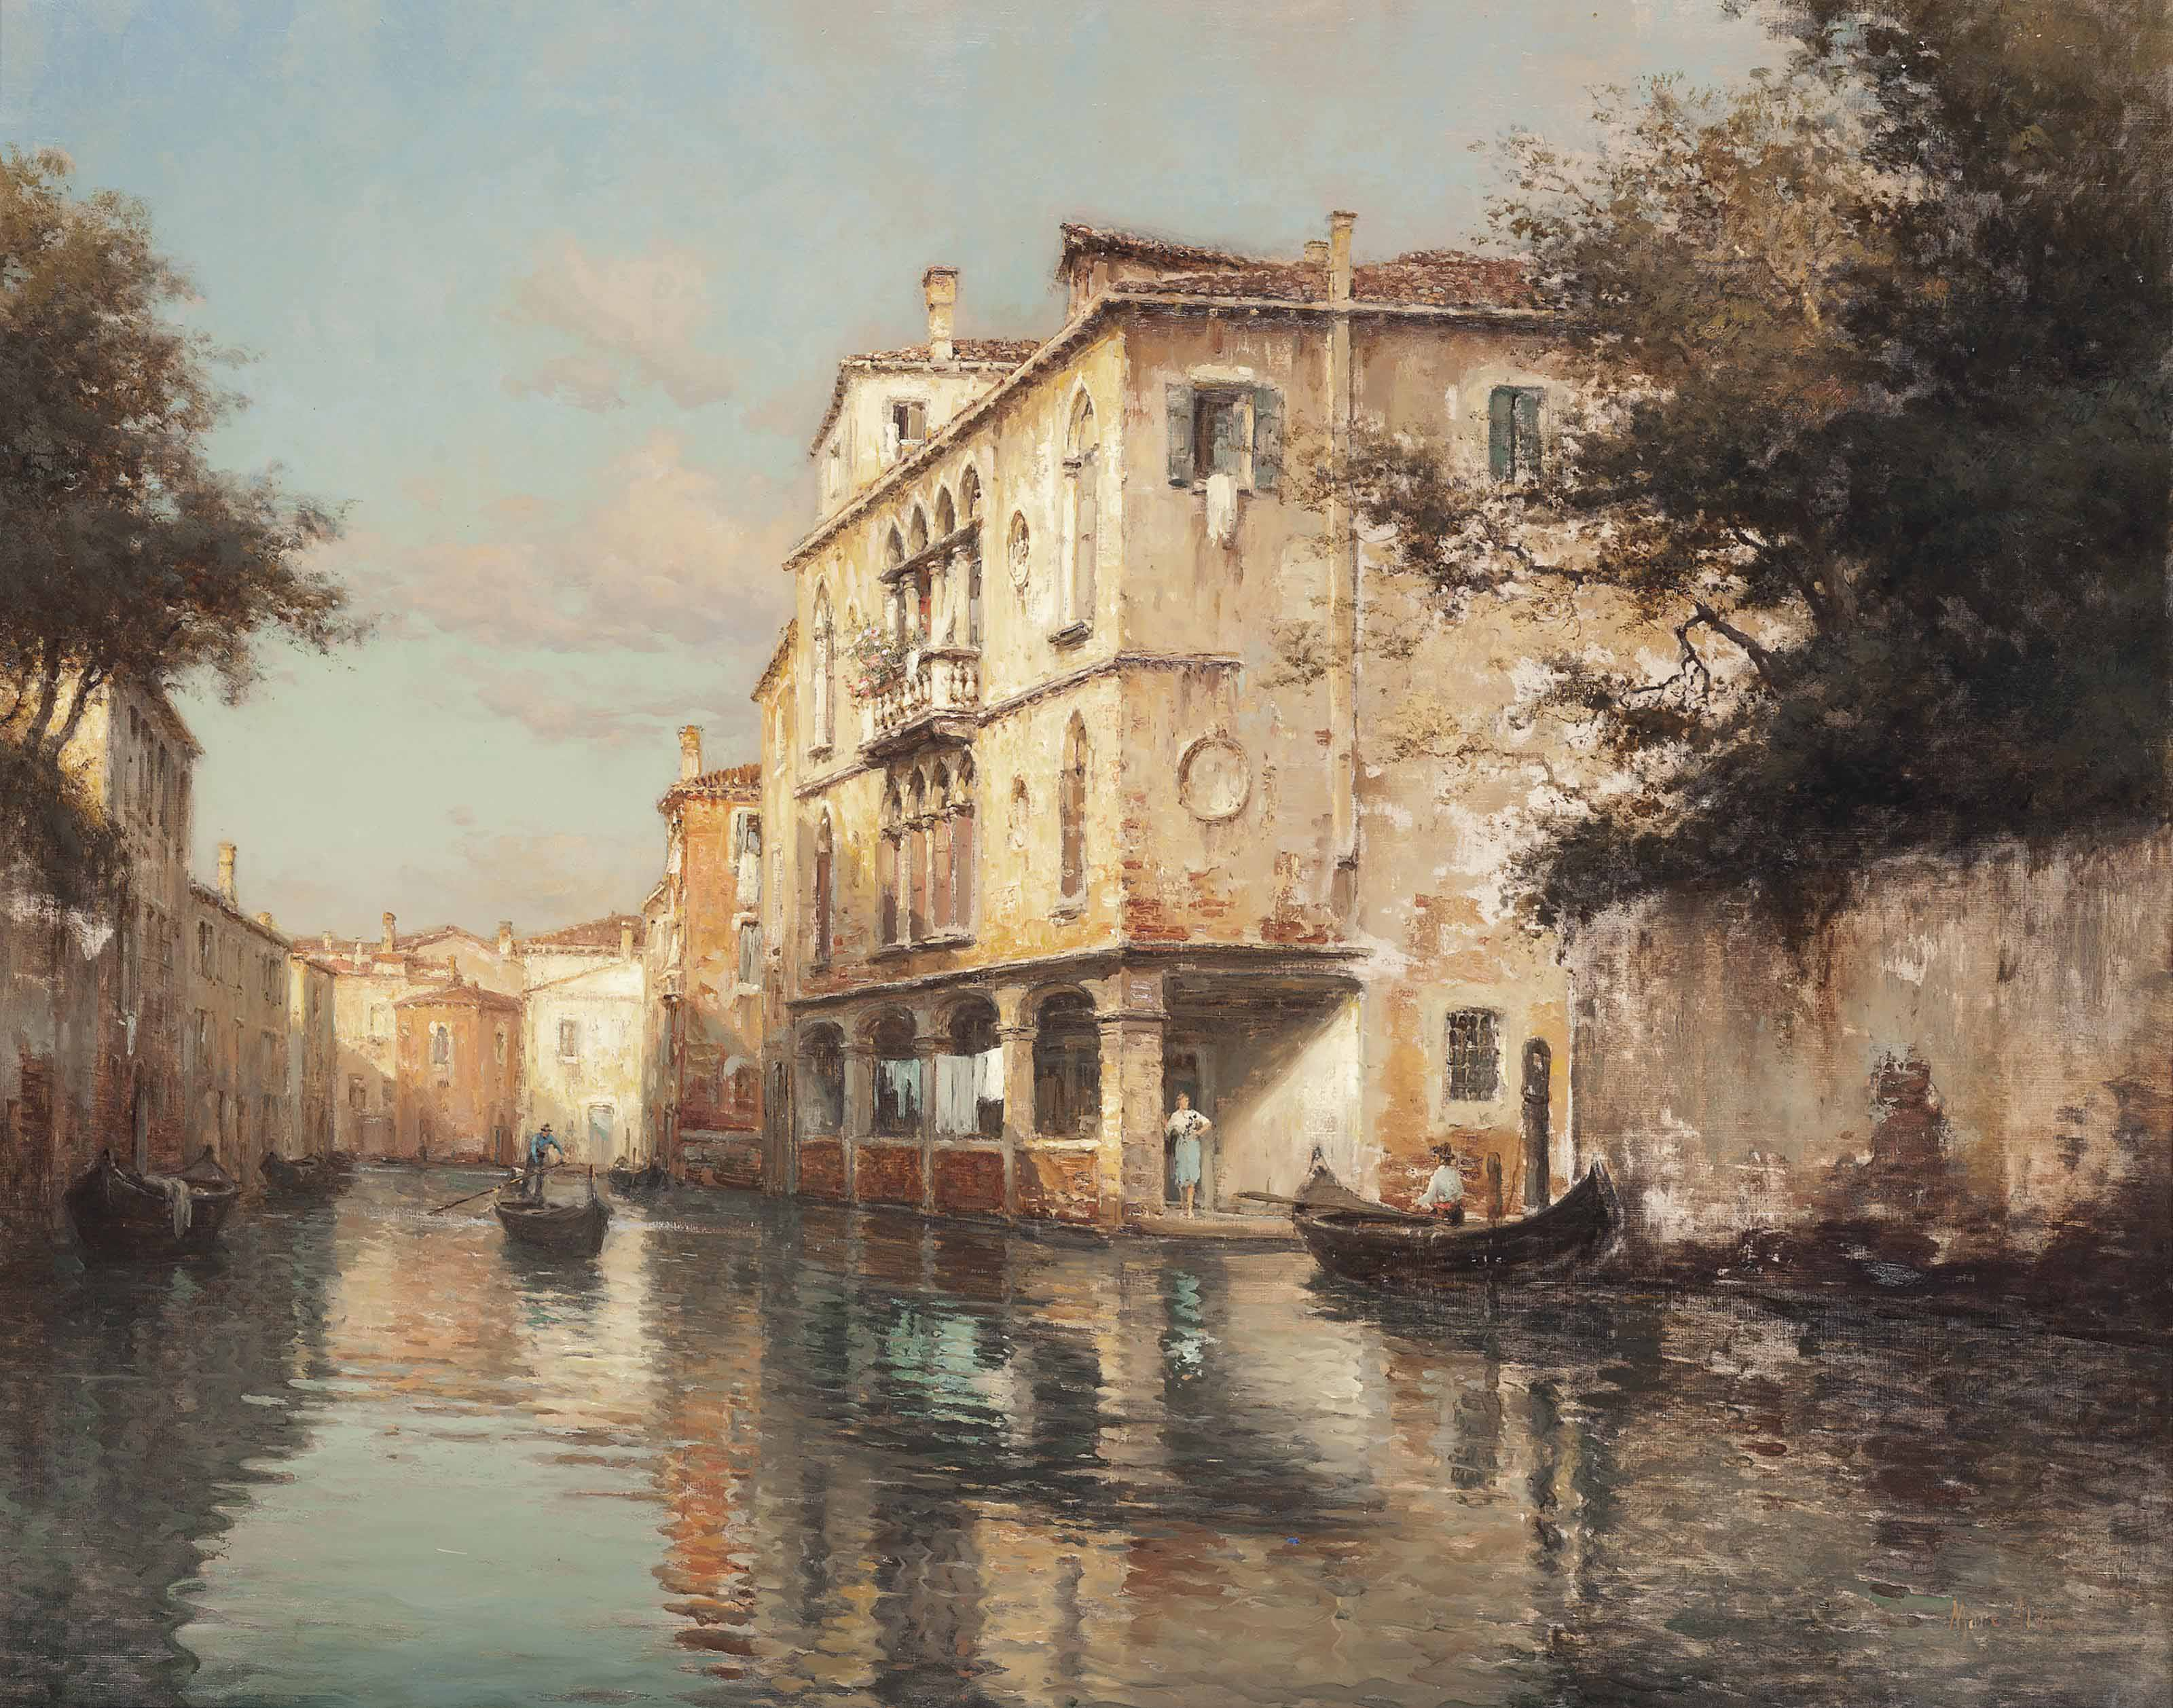 Antoine Bouvard (French, 1870-1956)